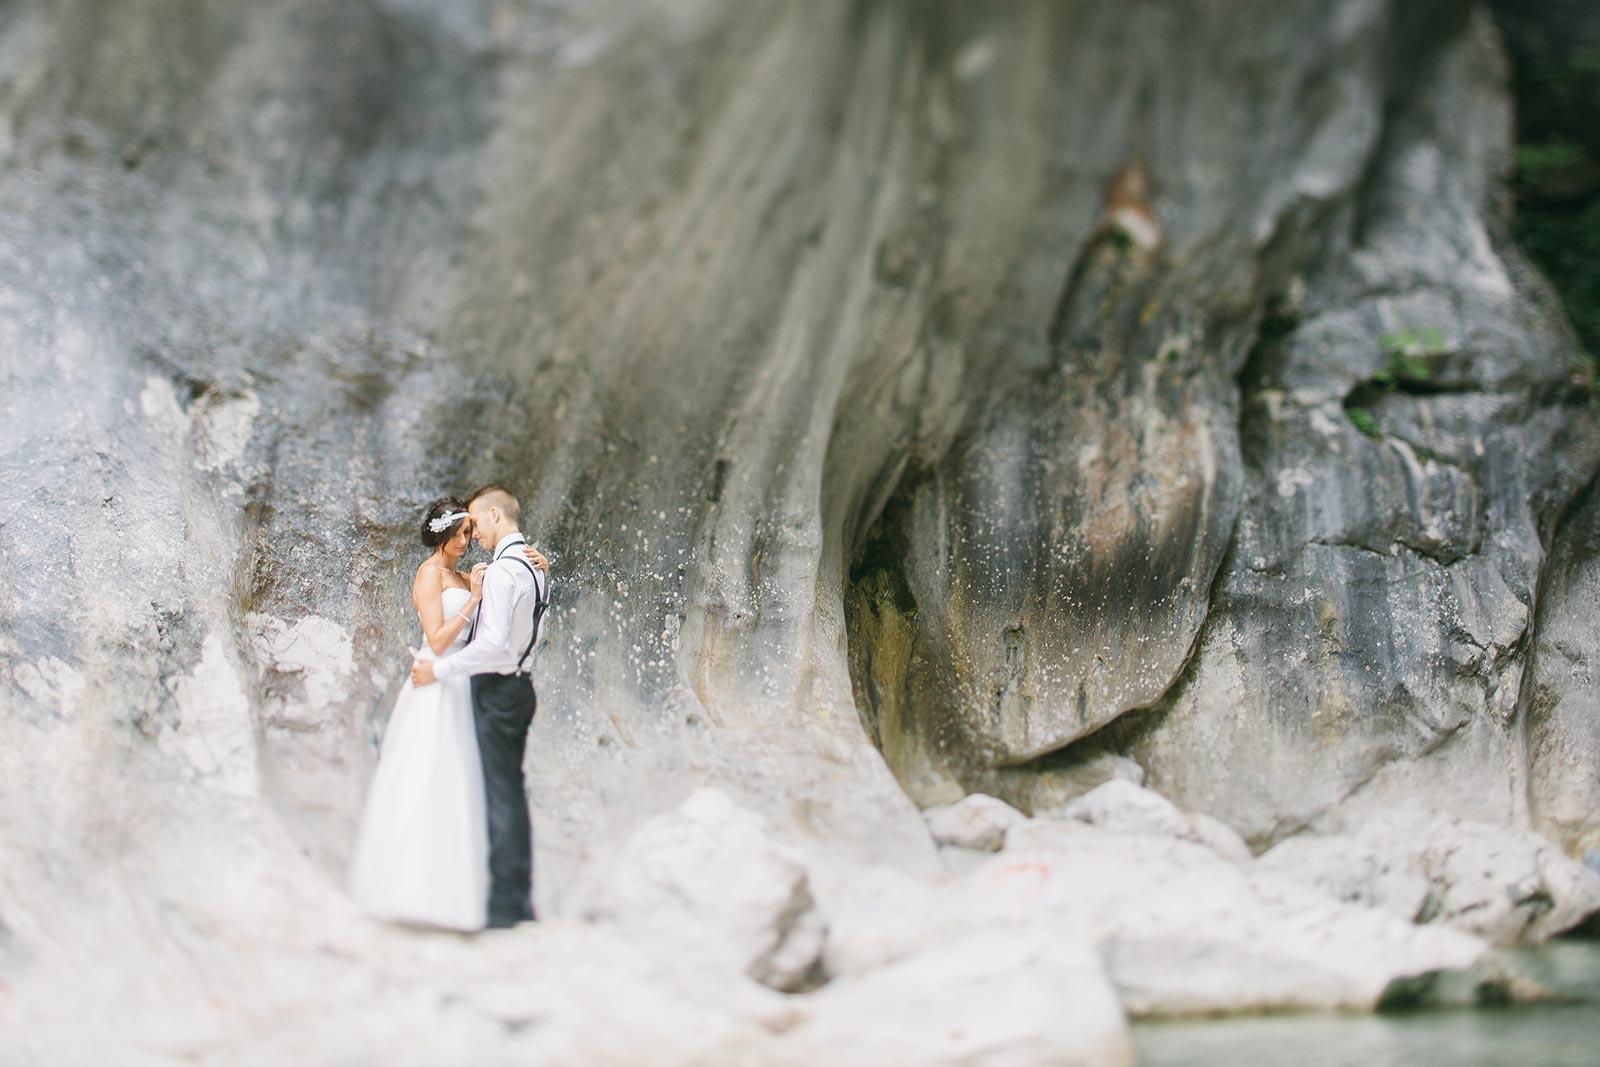 © Manuela & Martin Allinger (www.formafoto.net)